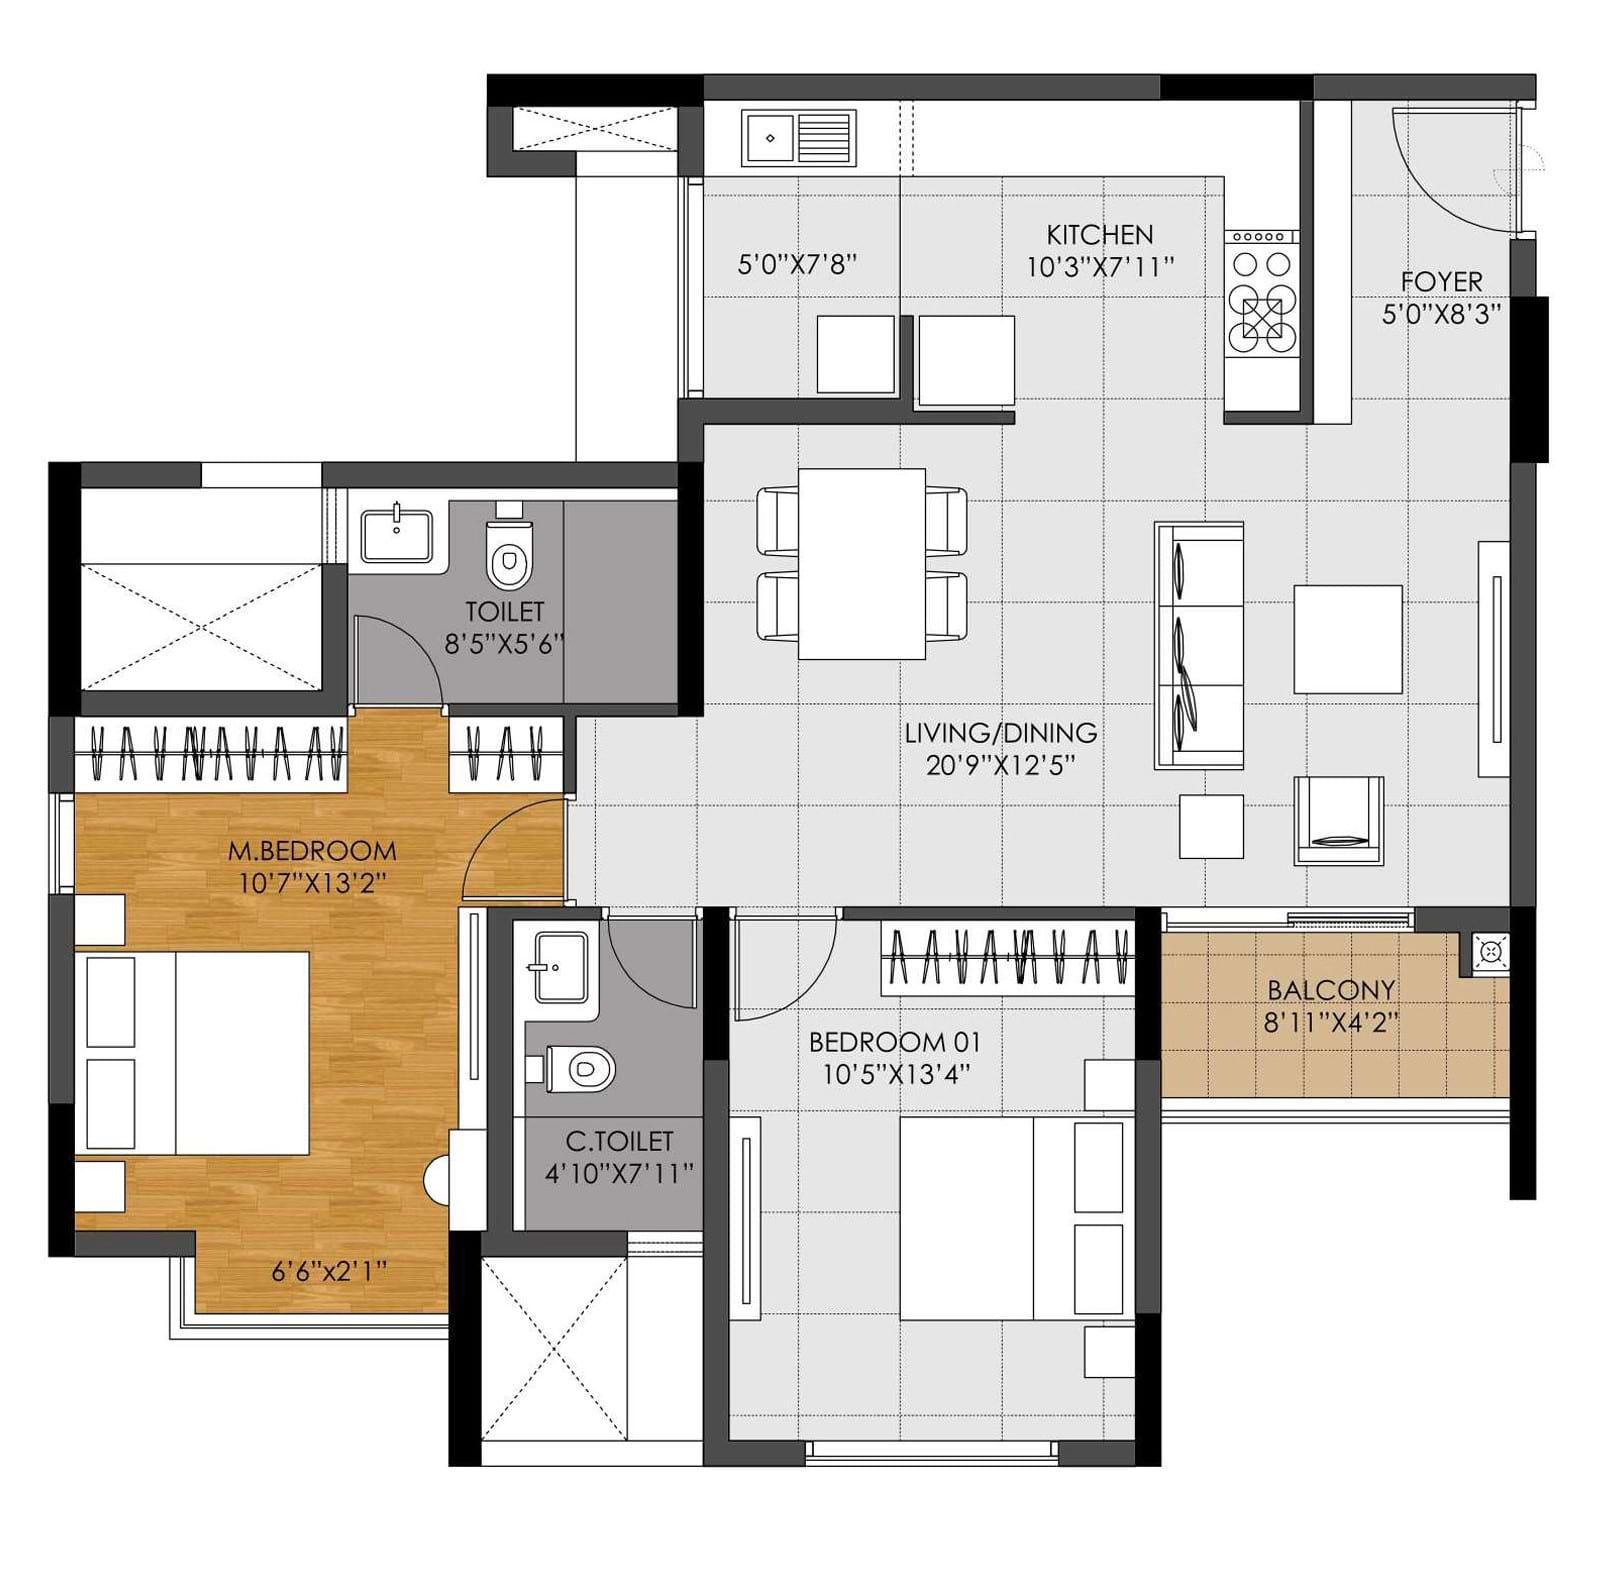 DNR-Casablanca-2bhk-1290-sqft-floorplan